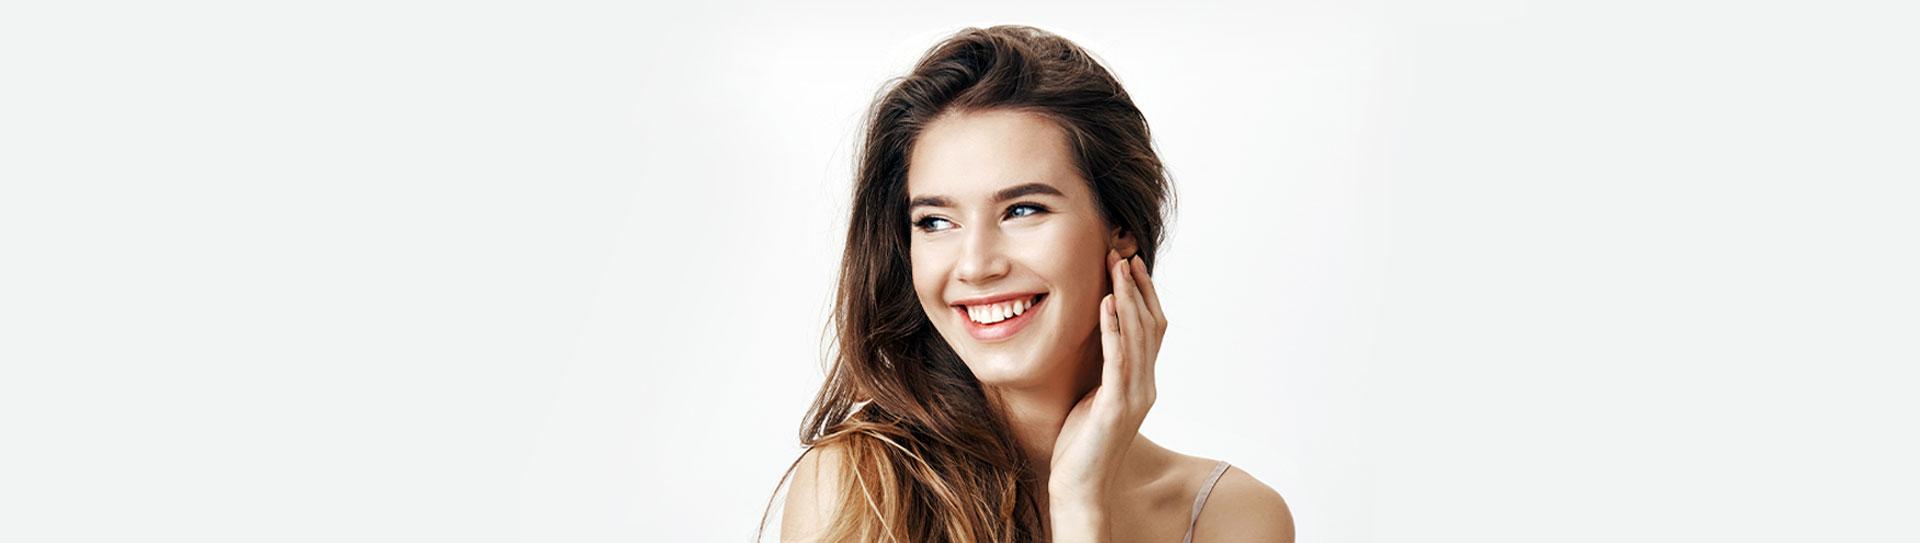 trattamento hydrafacial, trattamento viso, hydrafacial